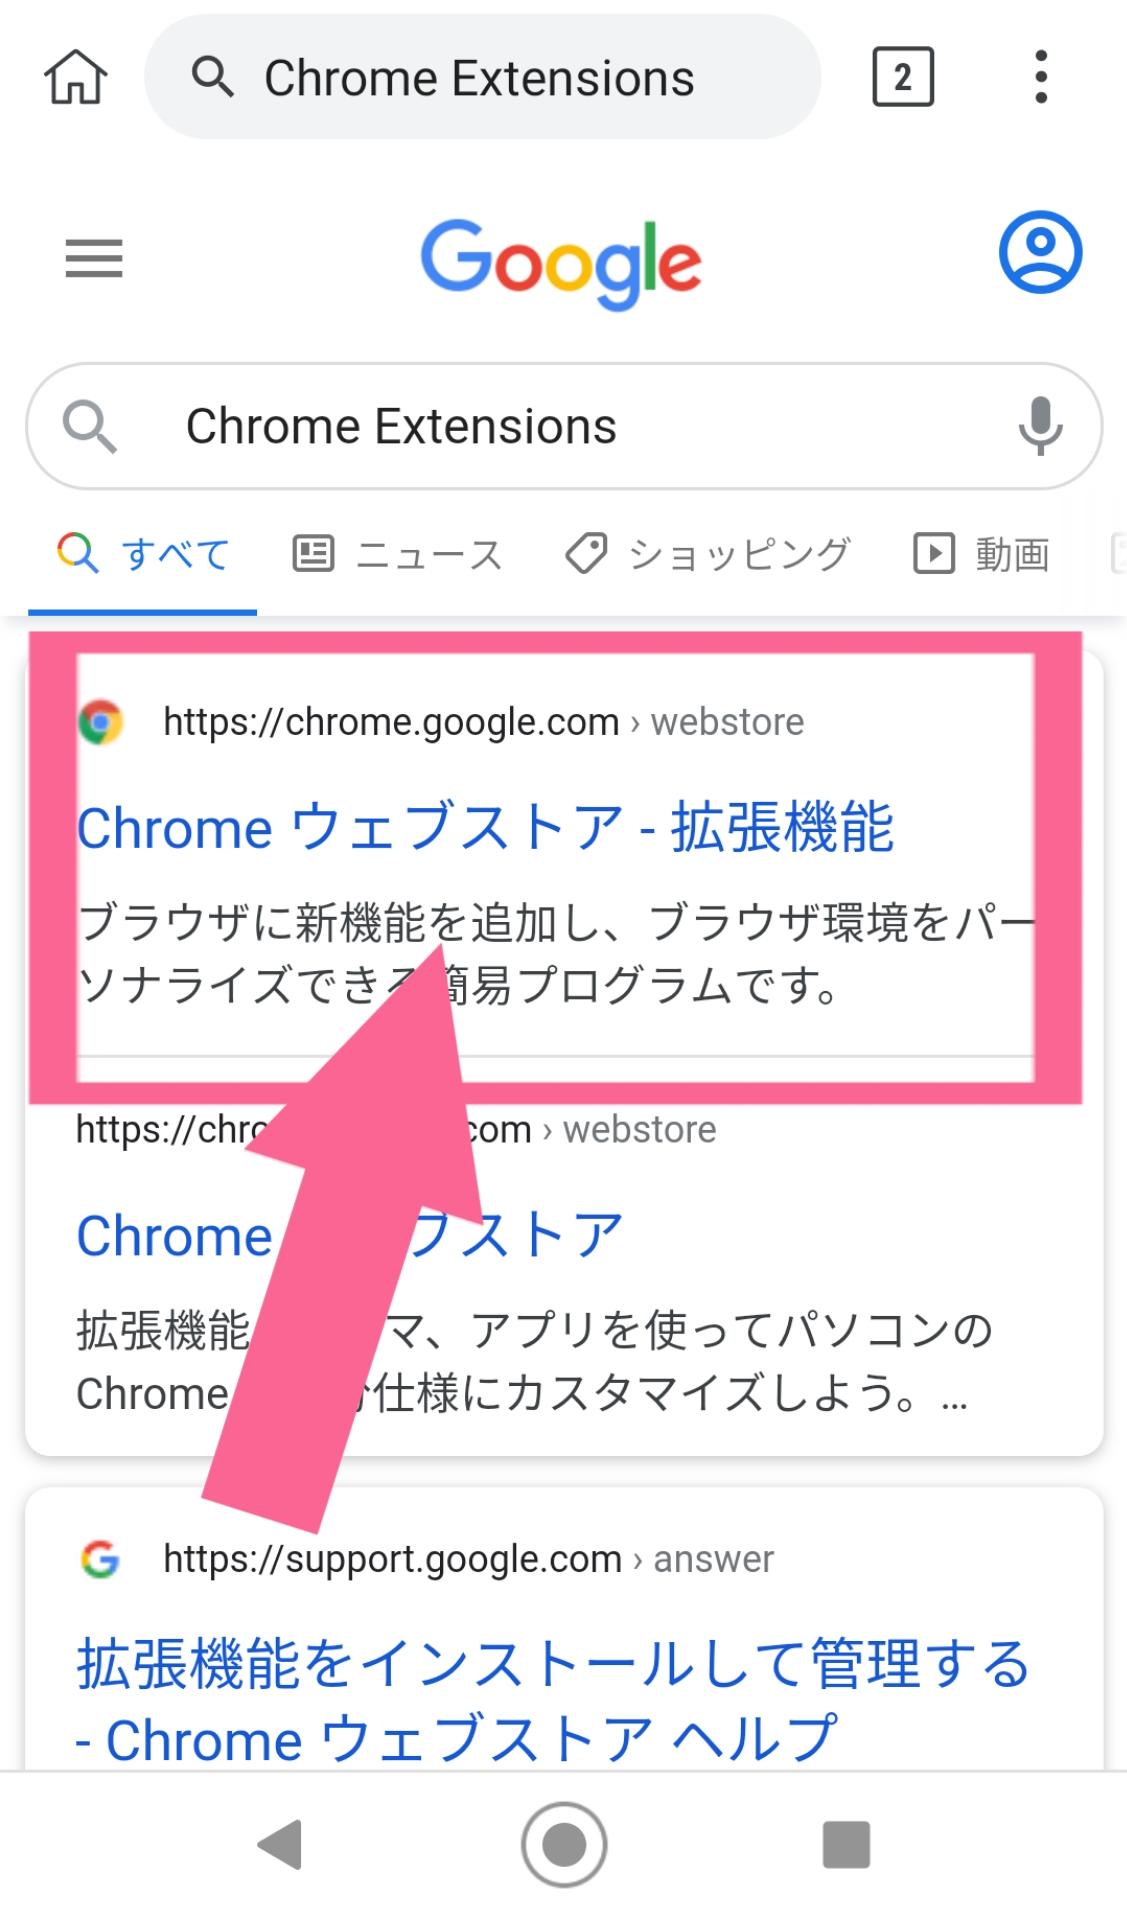 Kiwi Browser Google Chrome Extensions 検索結果 Chrome ウェブストア